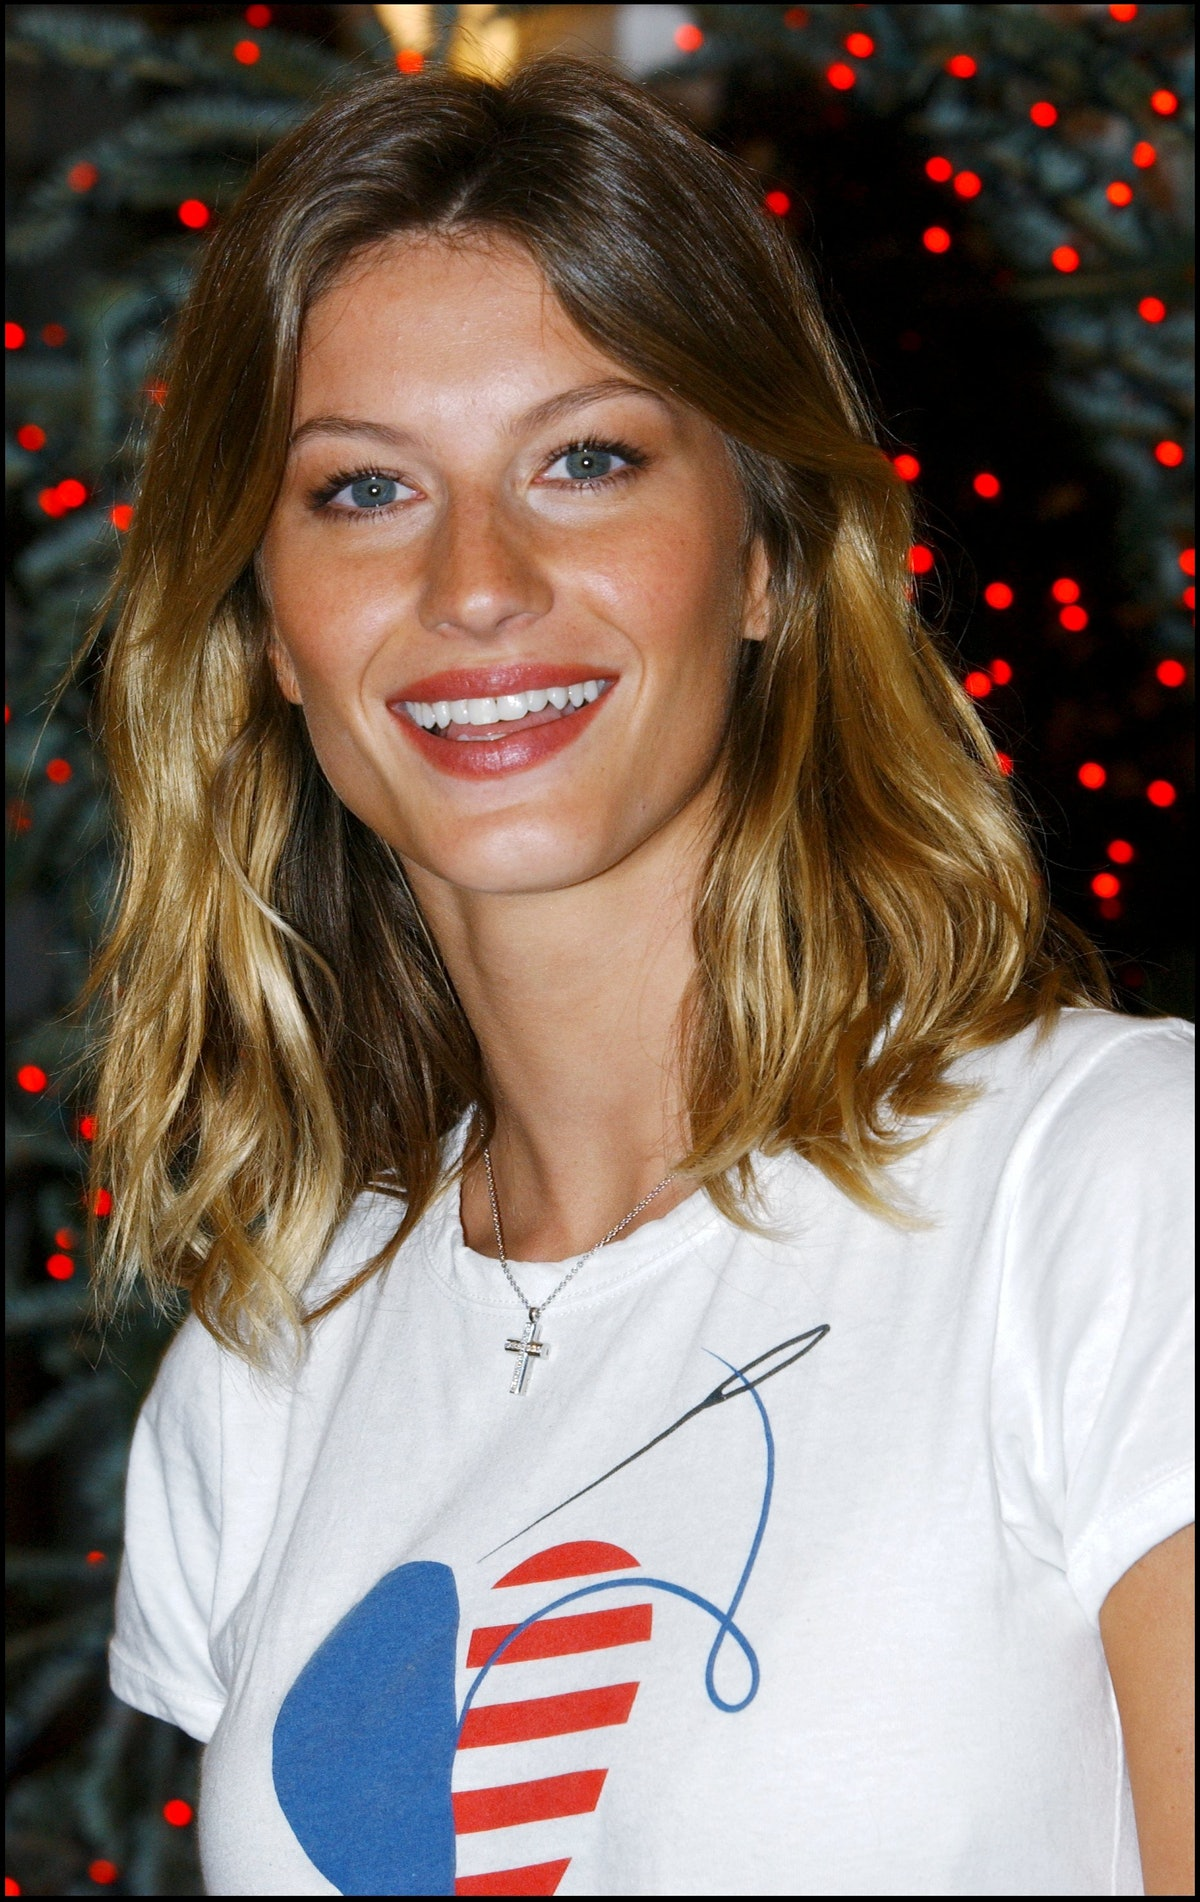 Girl friend of Leonardo Dicaprio, supermodel Gisele Bundchen autographs December cover of Vogue, fea...